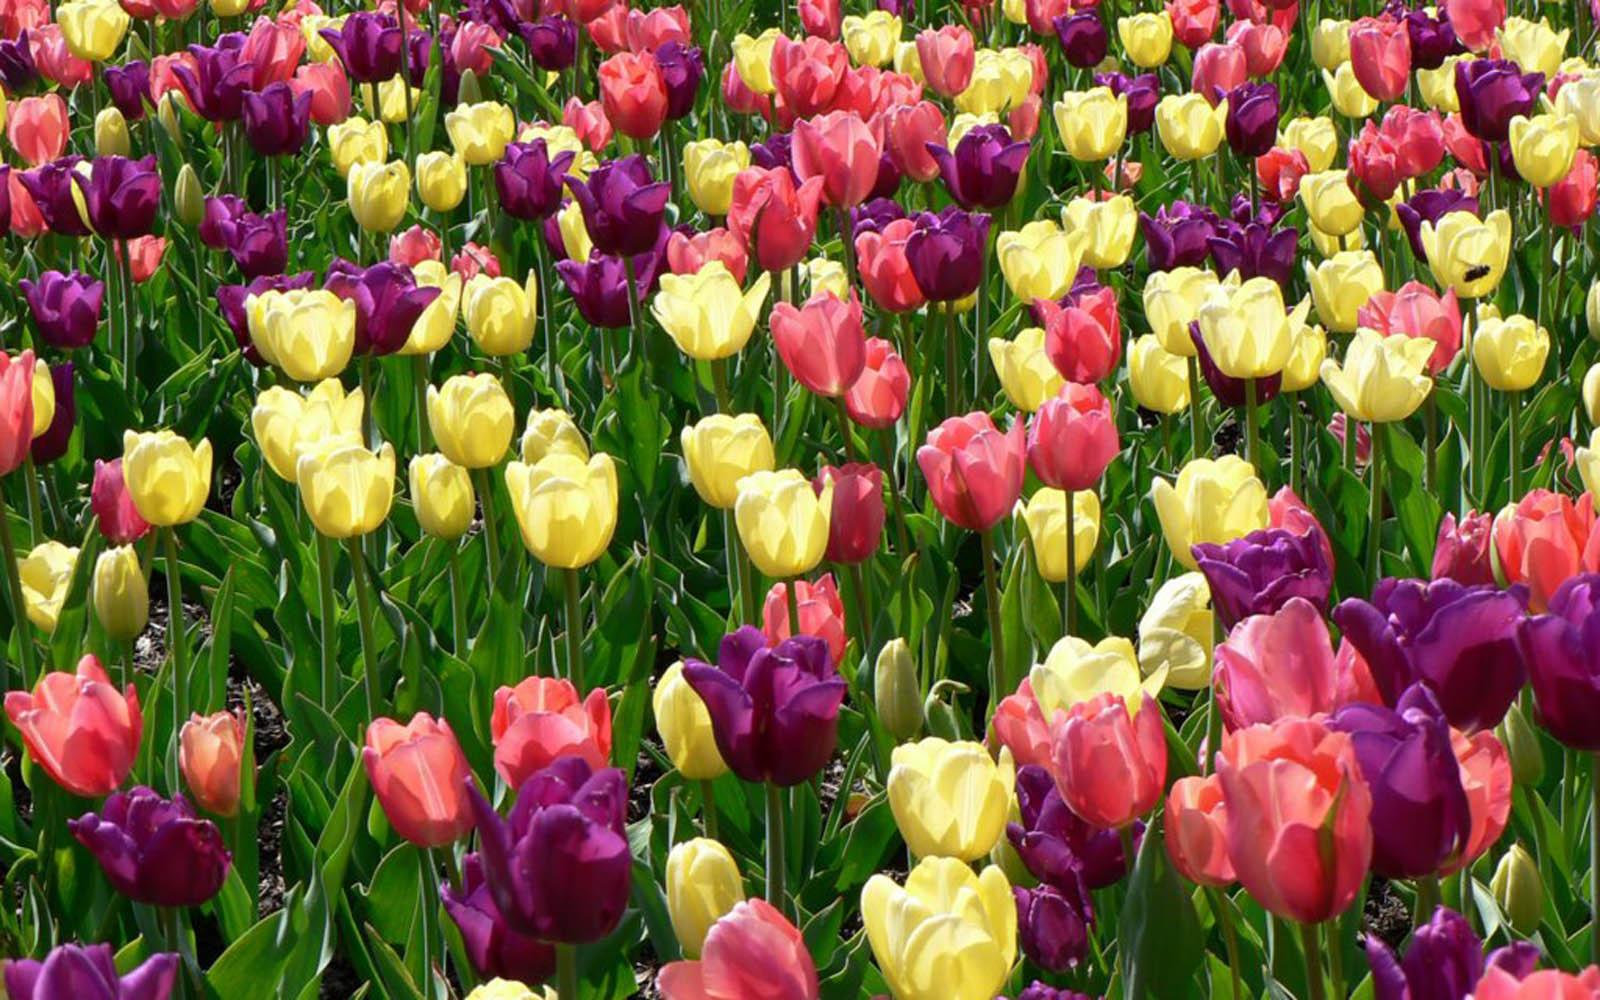 Spring Flowers Wallpaper Free Download